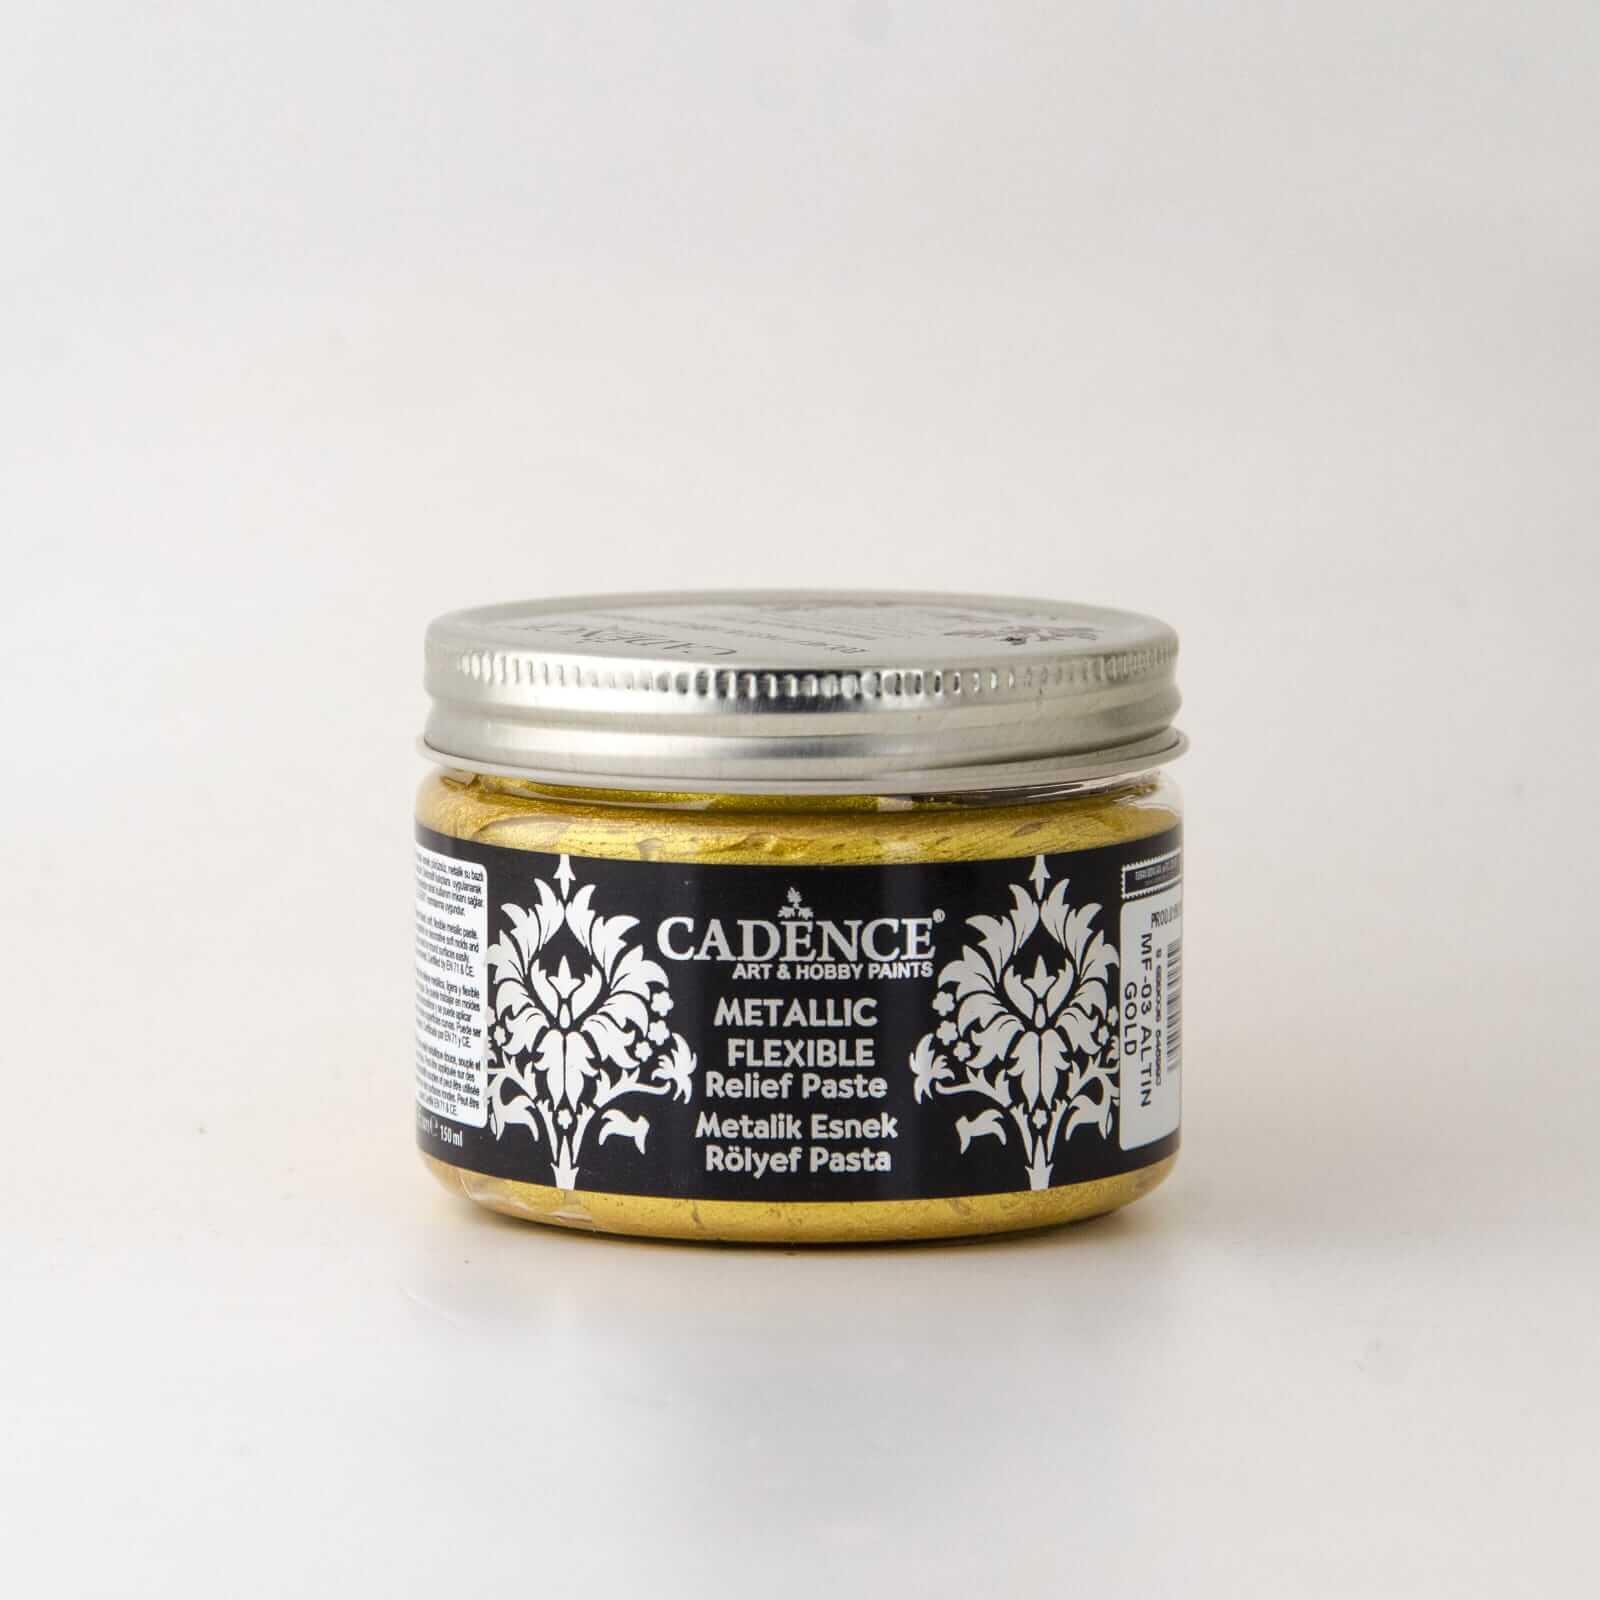 Cadence Metalik Esnek Rölyef Pasta - Cadence Rölyef Pasta - Altın Renk Dolgu